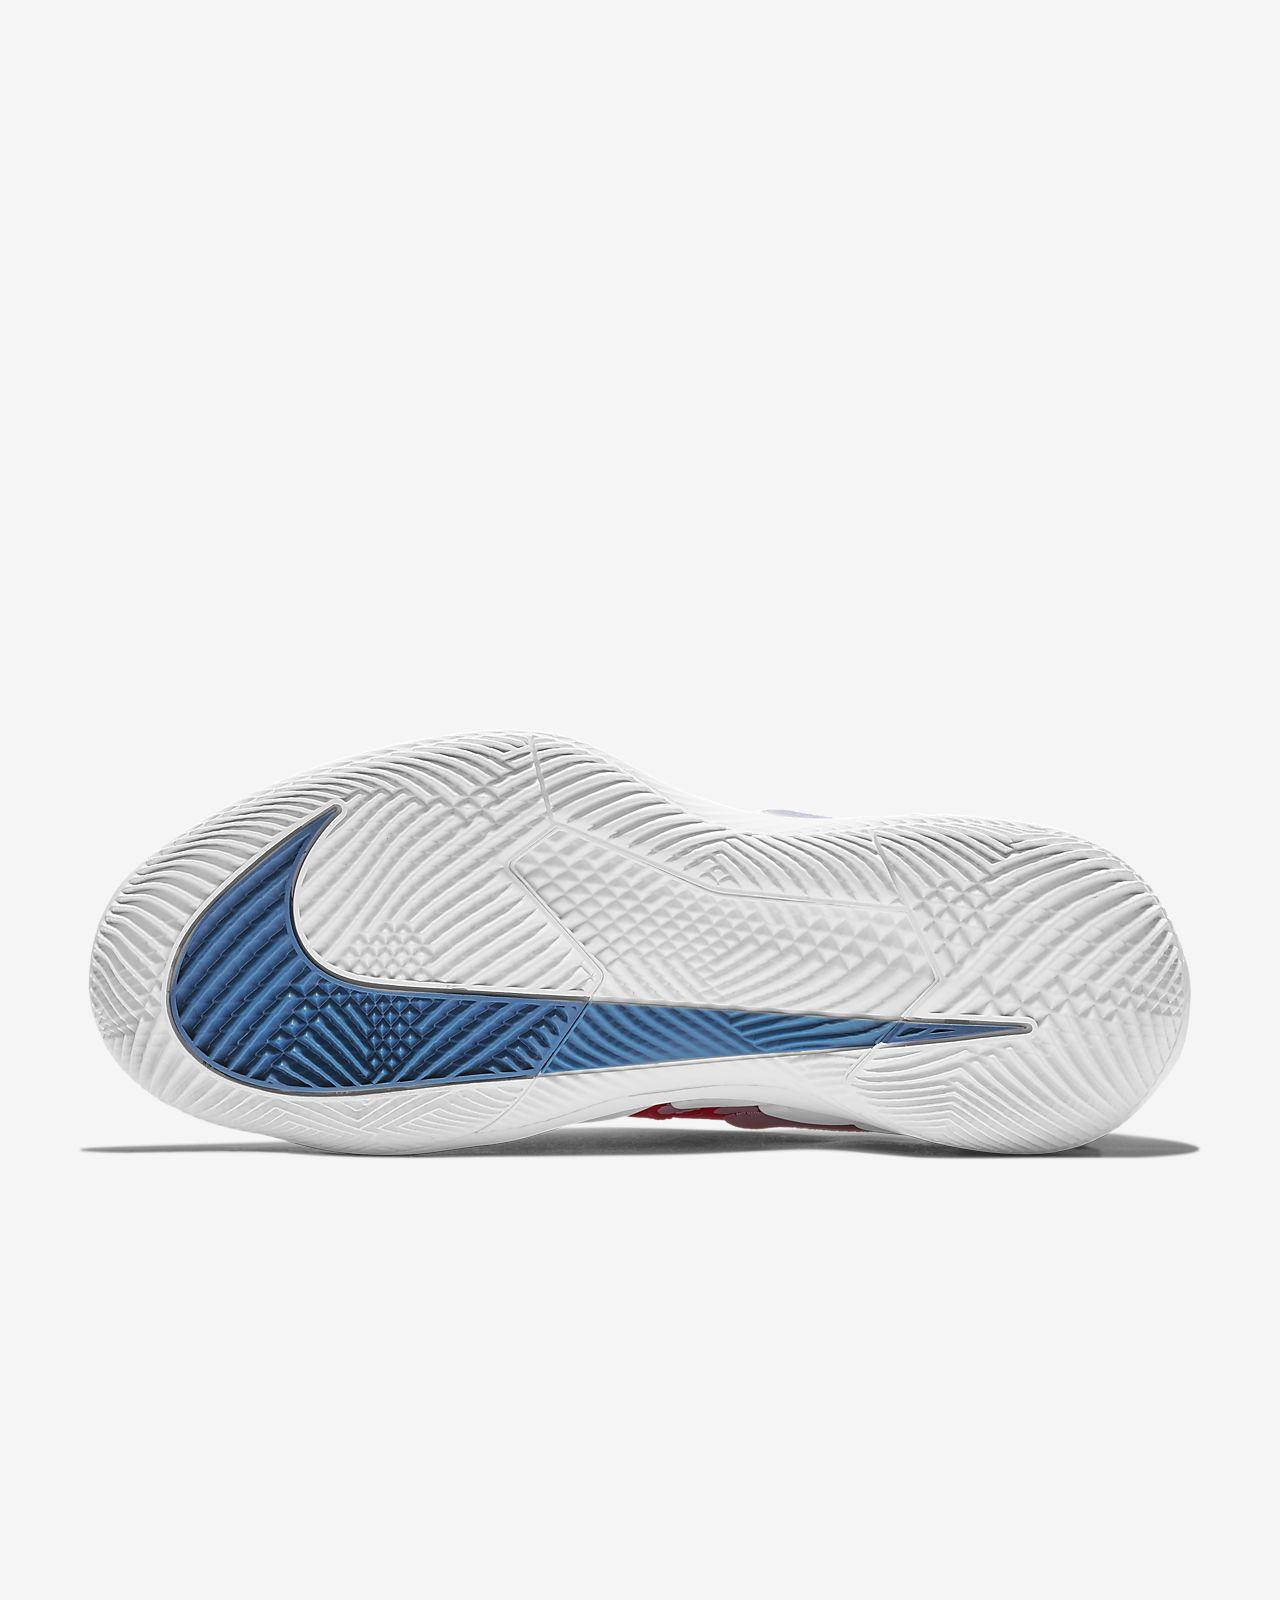 low priced 690cc 84403 NikeCourt Air Zoom Vapor X Hardcourt tennisschoen voor dames. Nike ...